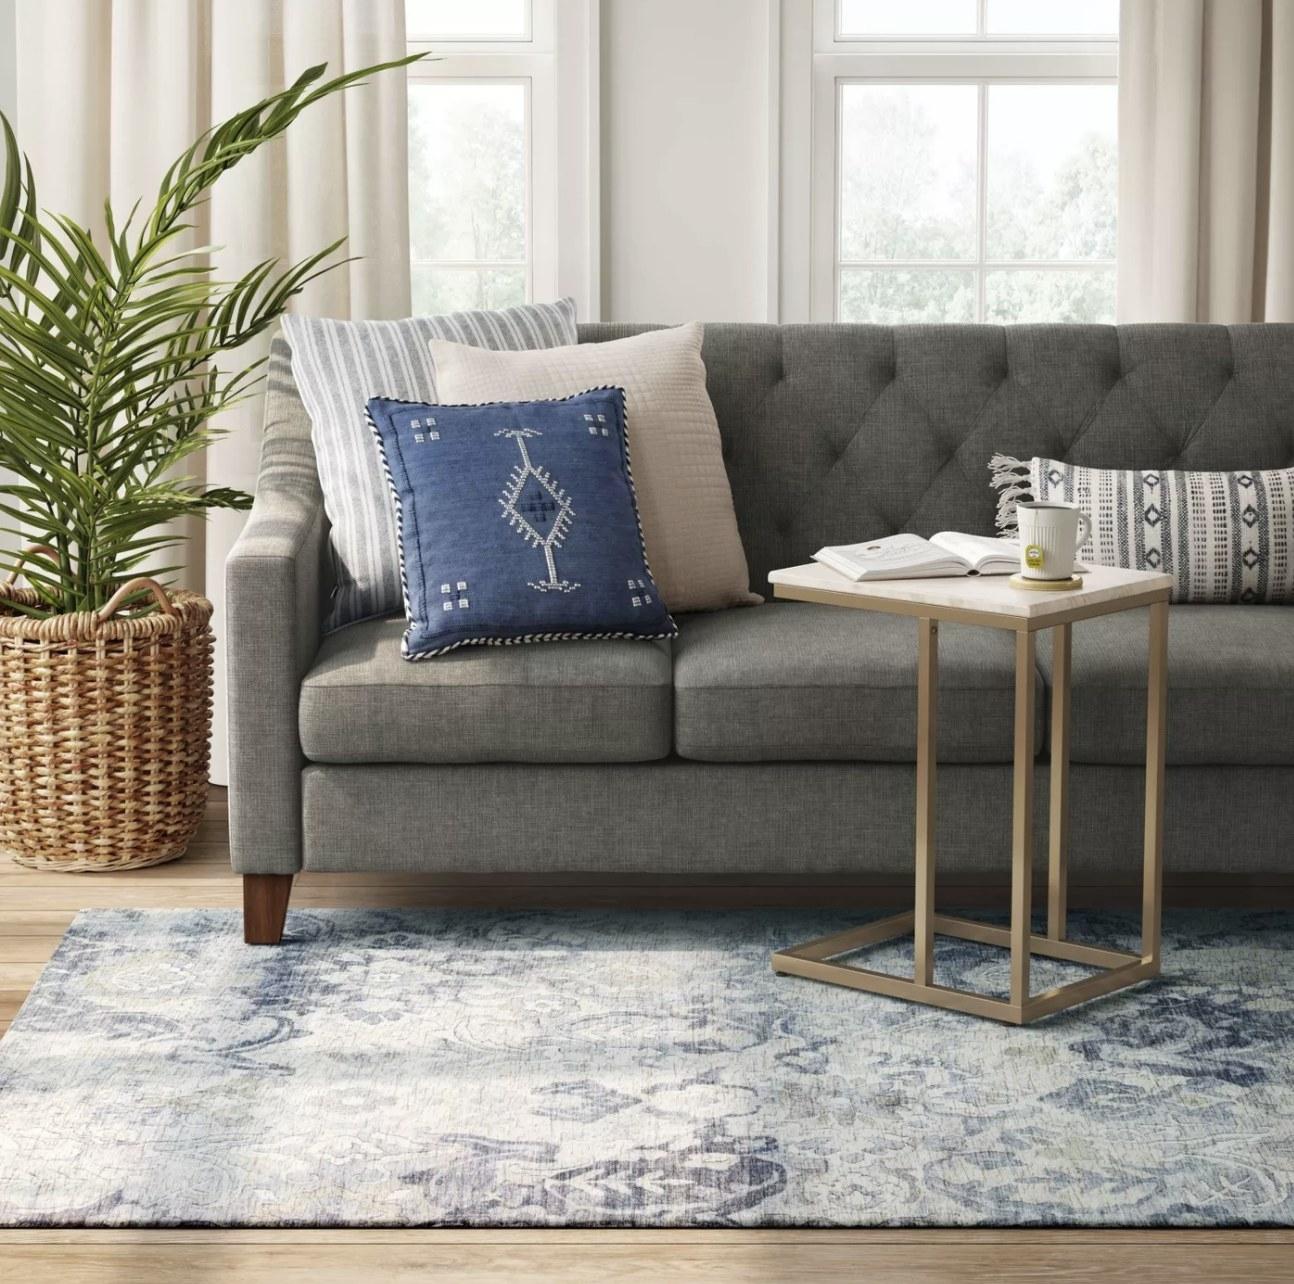 Rug in living room